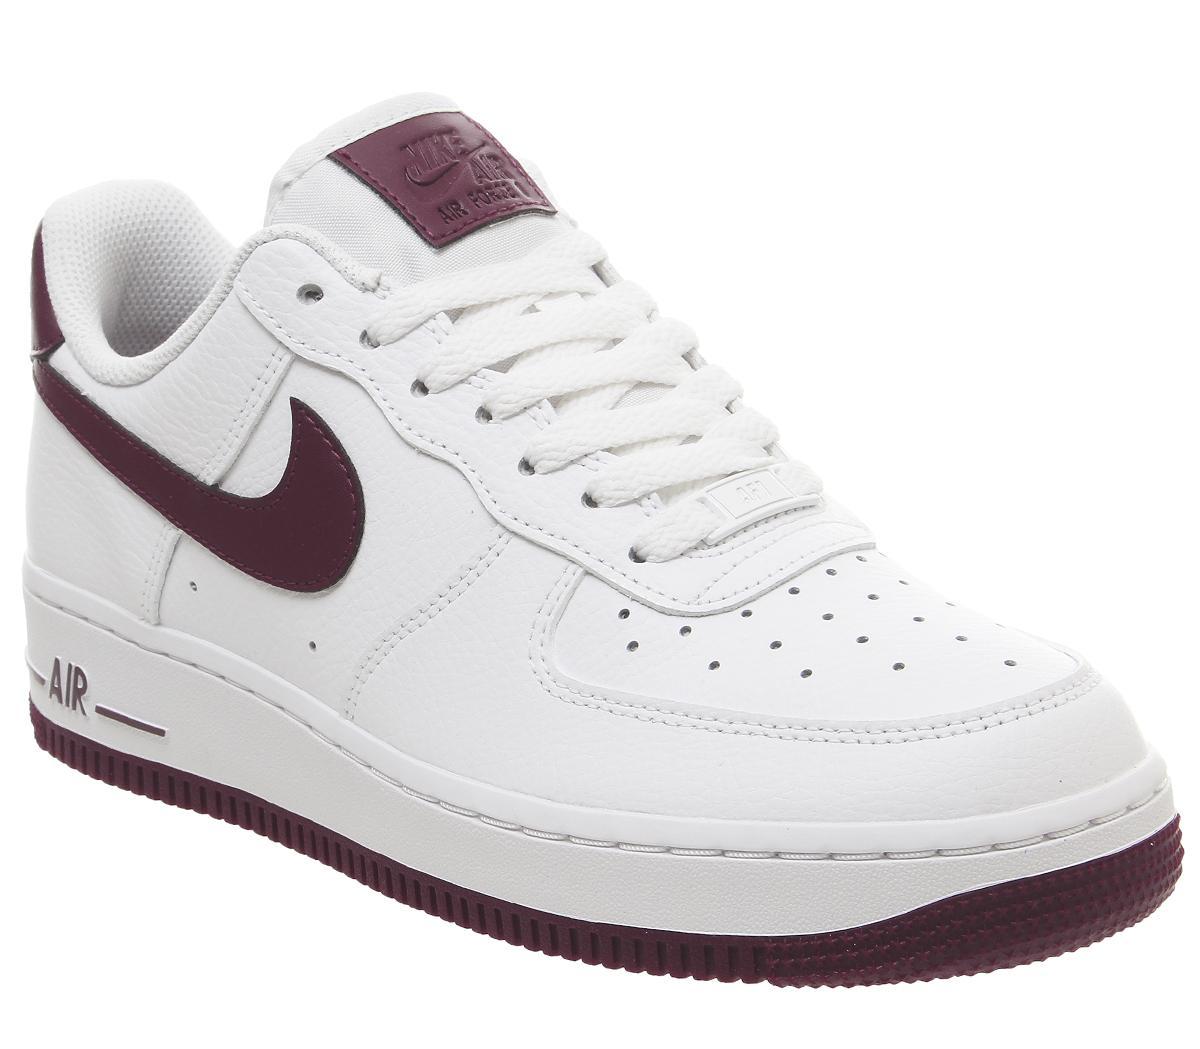 Nike Air Force 1 07 Trainers White Bordeaux Sneaker damen